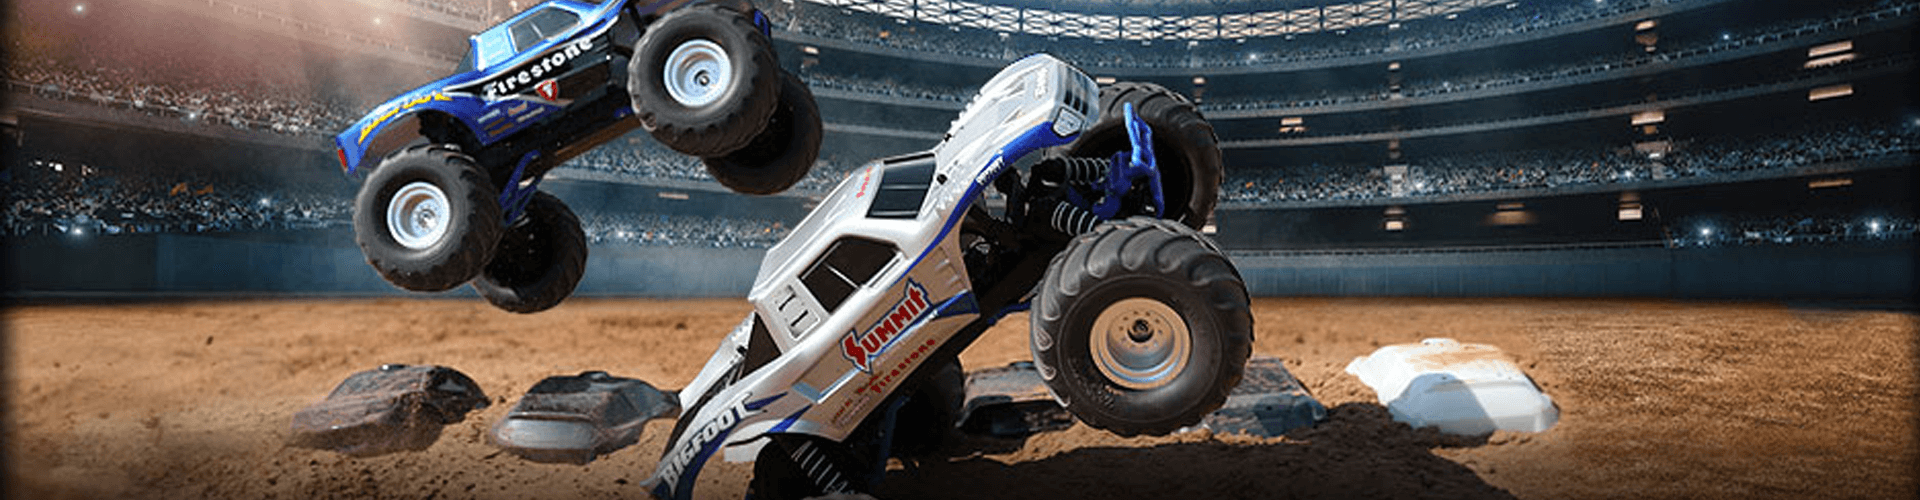 Big wheels on dirt track